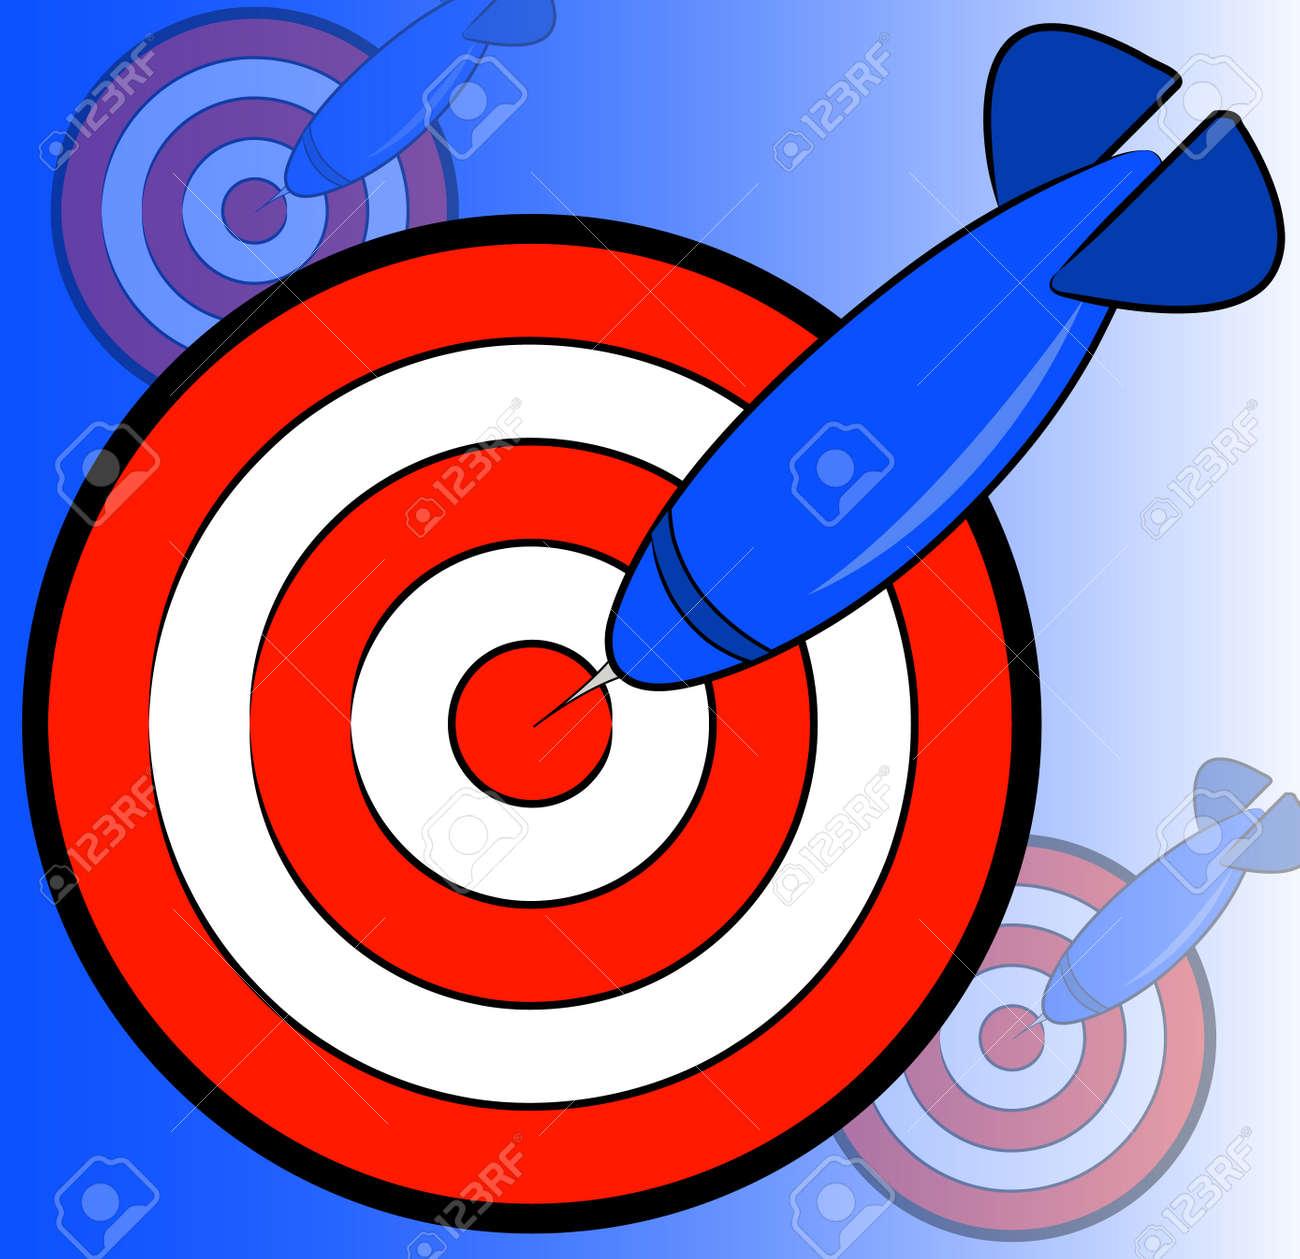 dart and bullseye background on blue - hitting the target - vector Stock Vector - 2752115